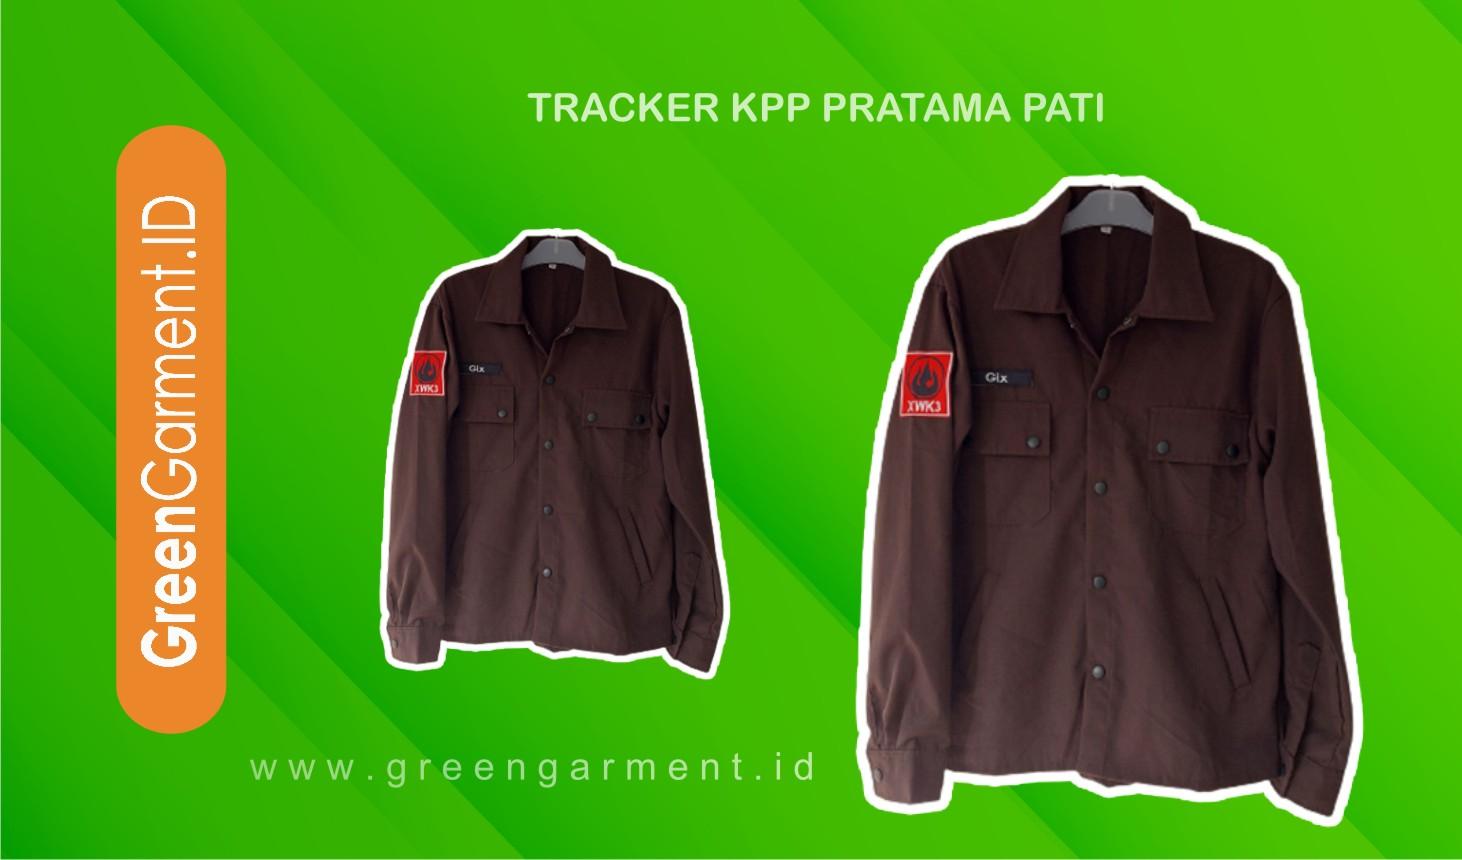 KPP Pratama Pati